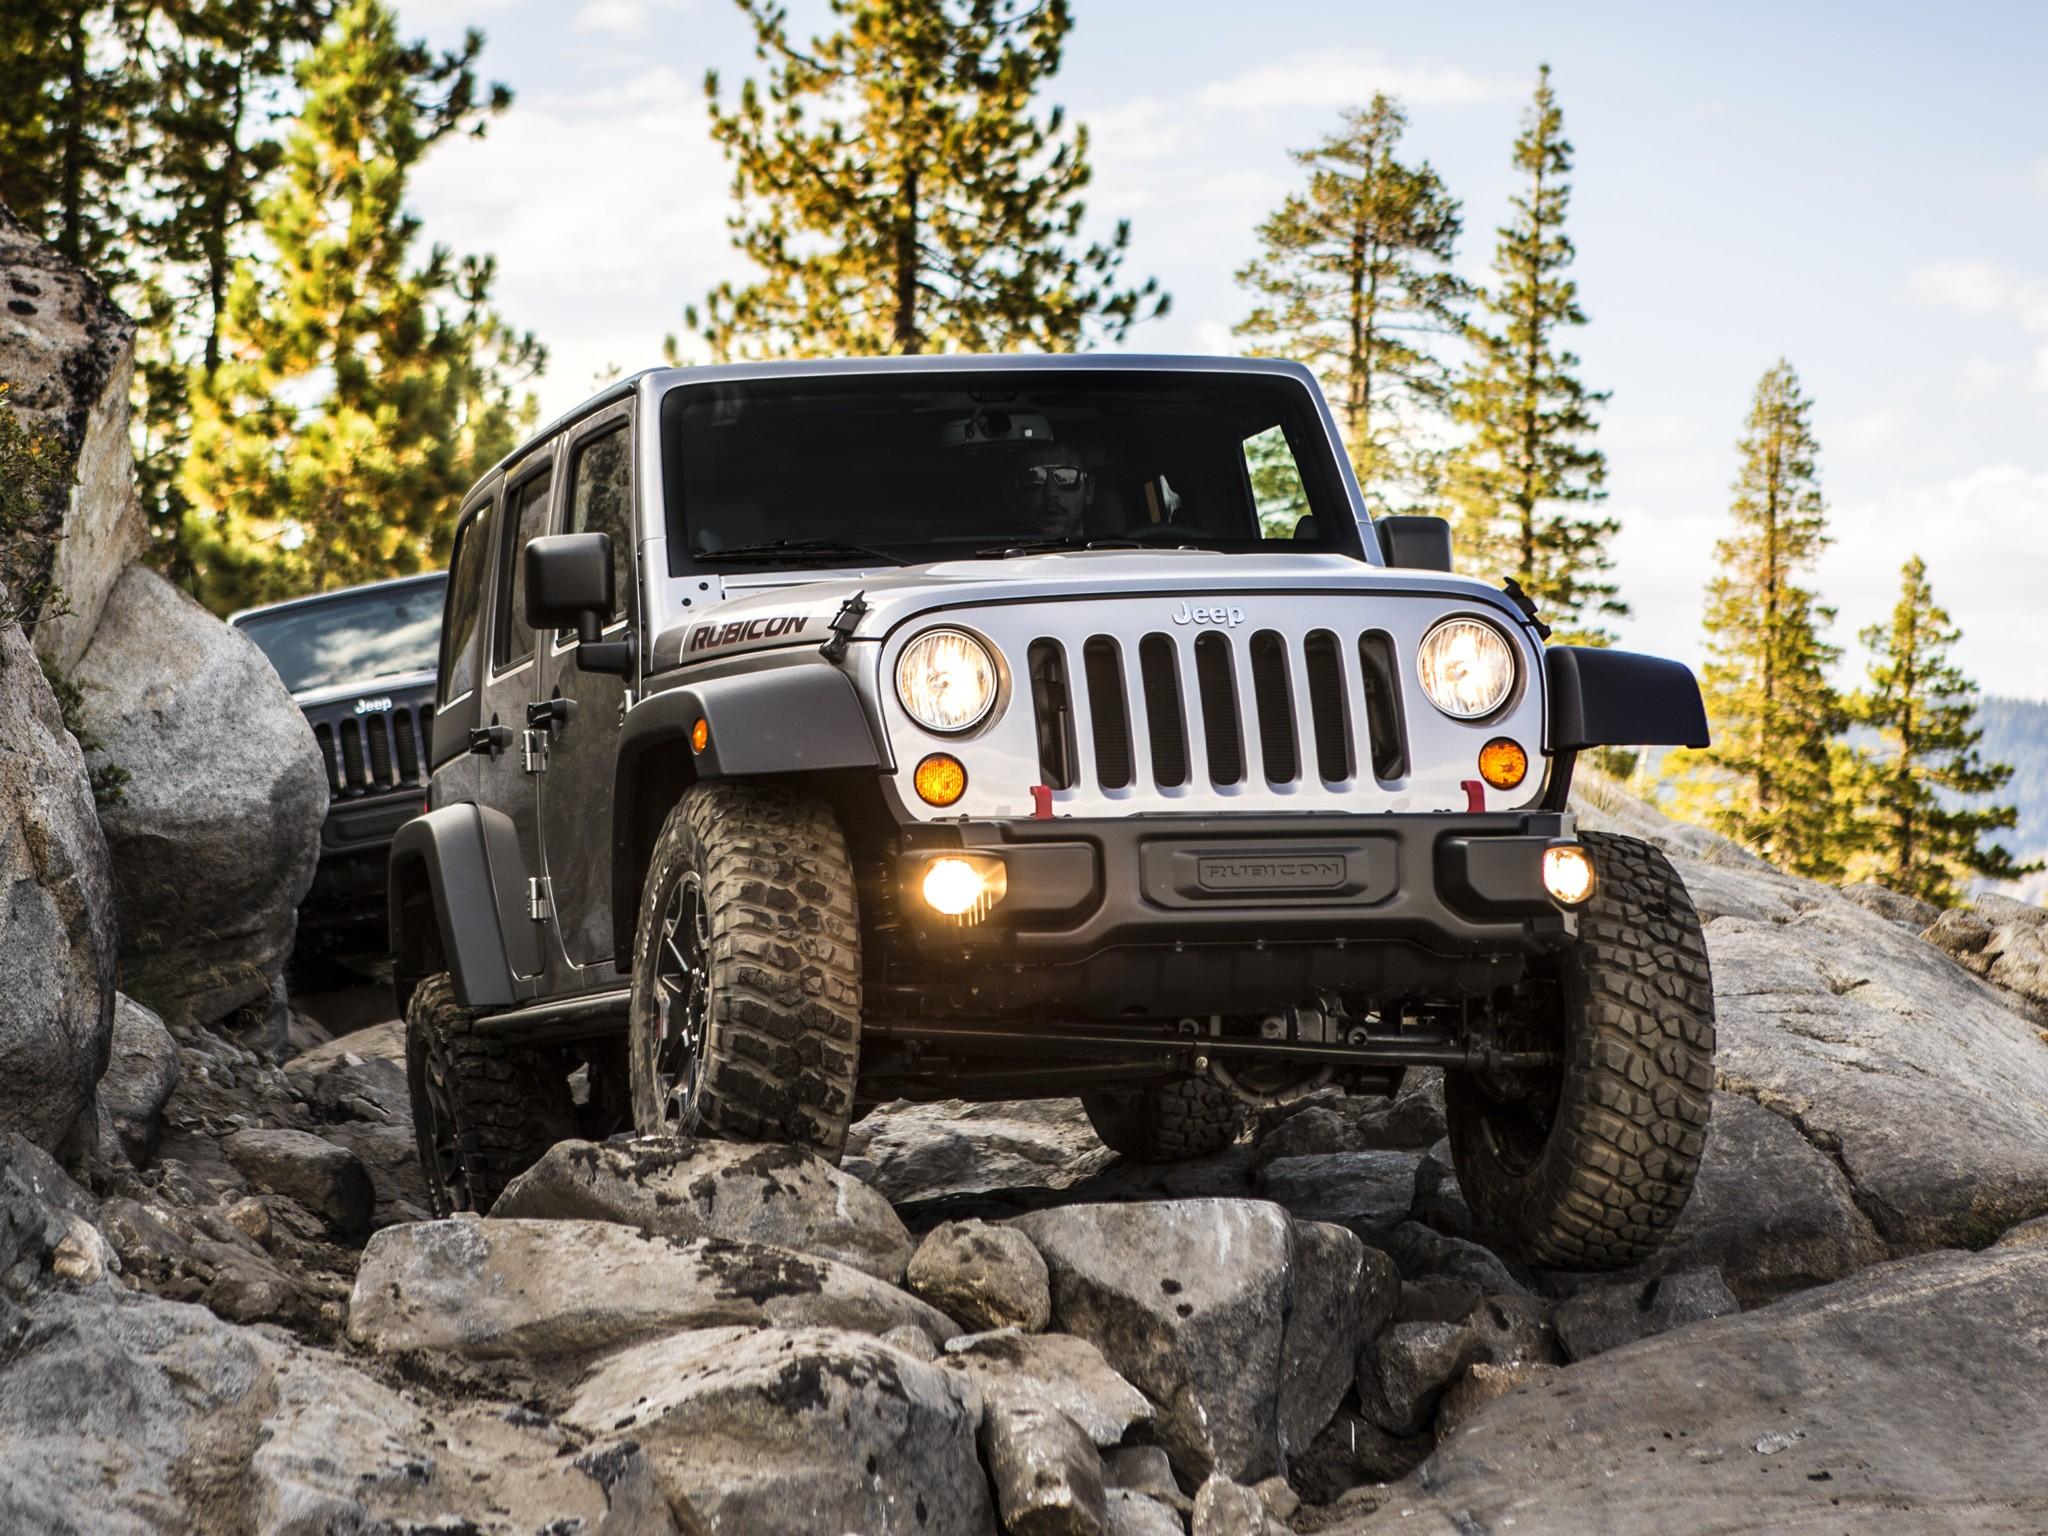 Hum-Vee Style Four Door Jeep Wrangler Sahara 4x4 Featured